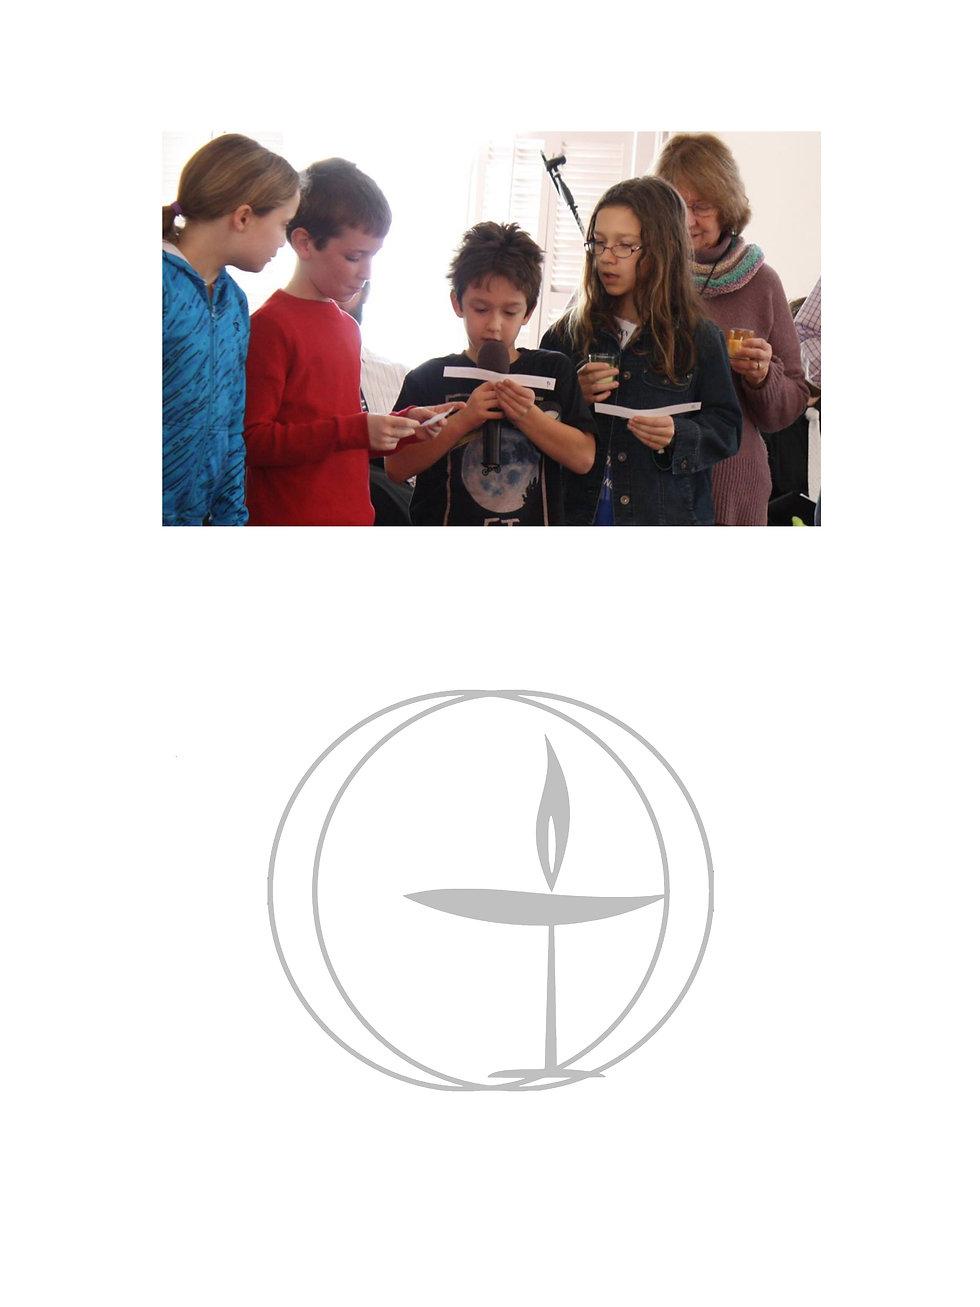 Kids speaking Strip Background Image 3Kx4K.jpg